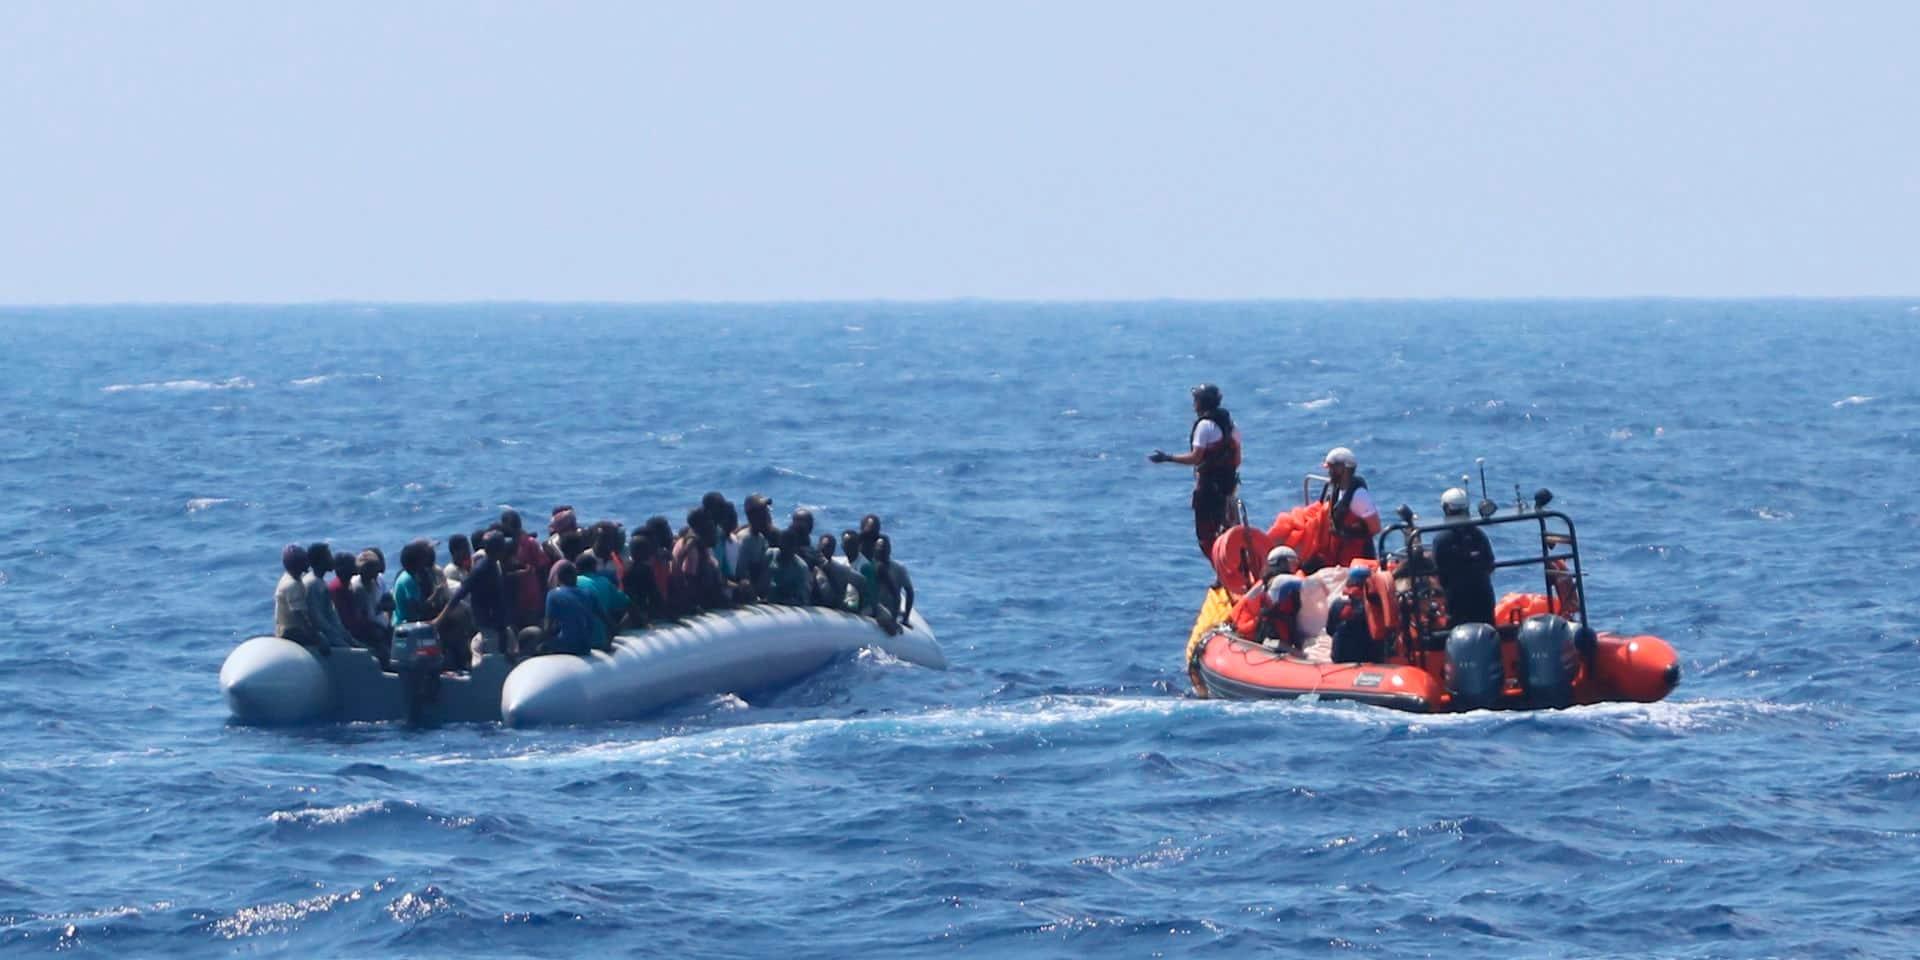 L'Ocean Viking débarque 236 migrants en Sicile